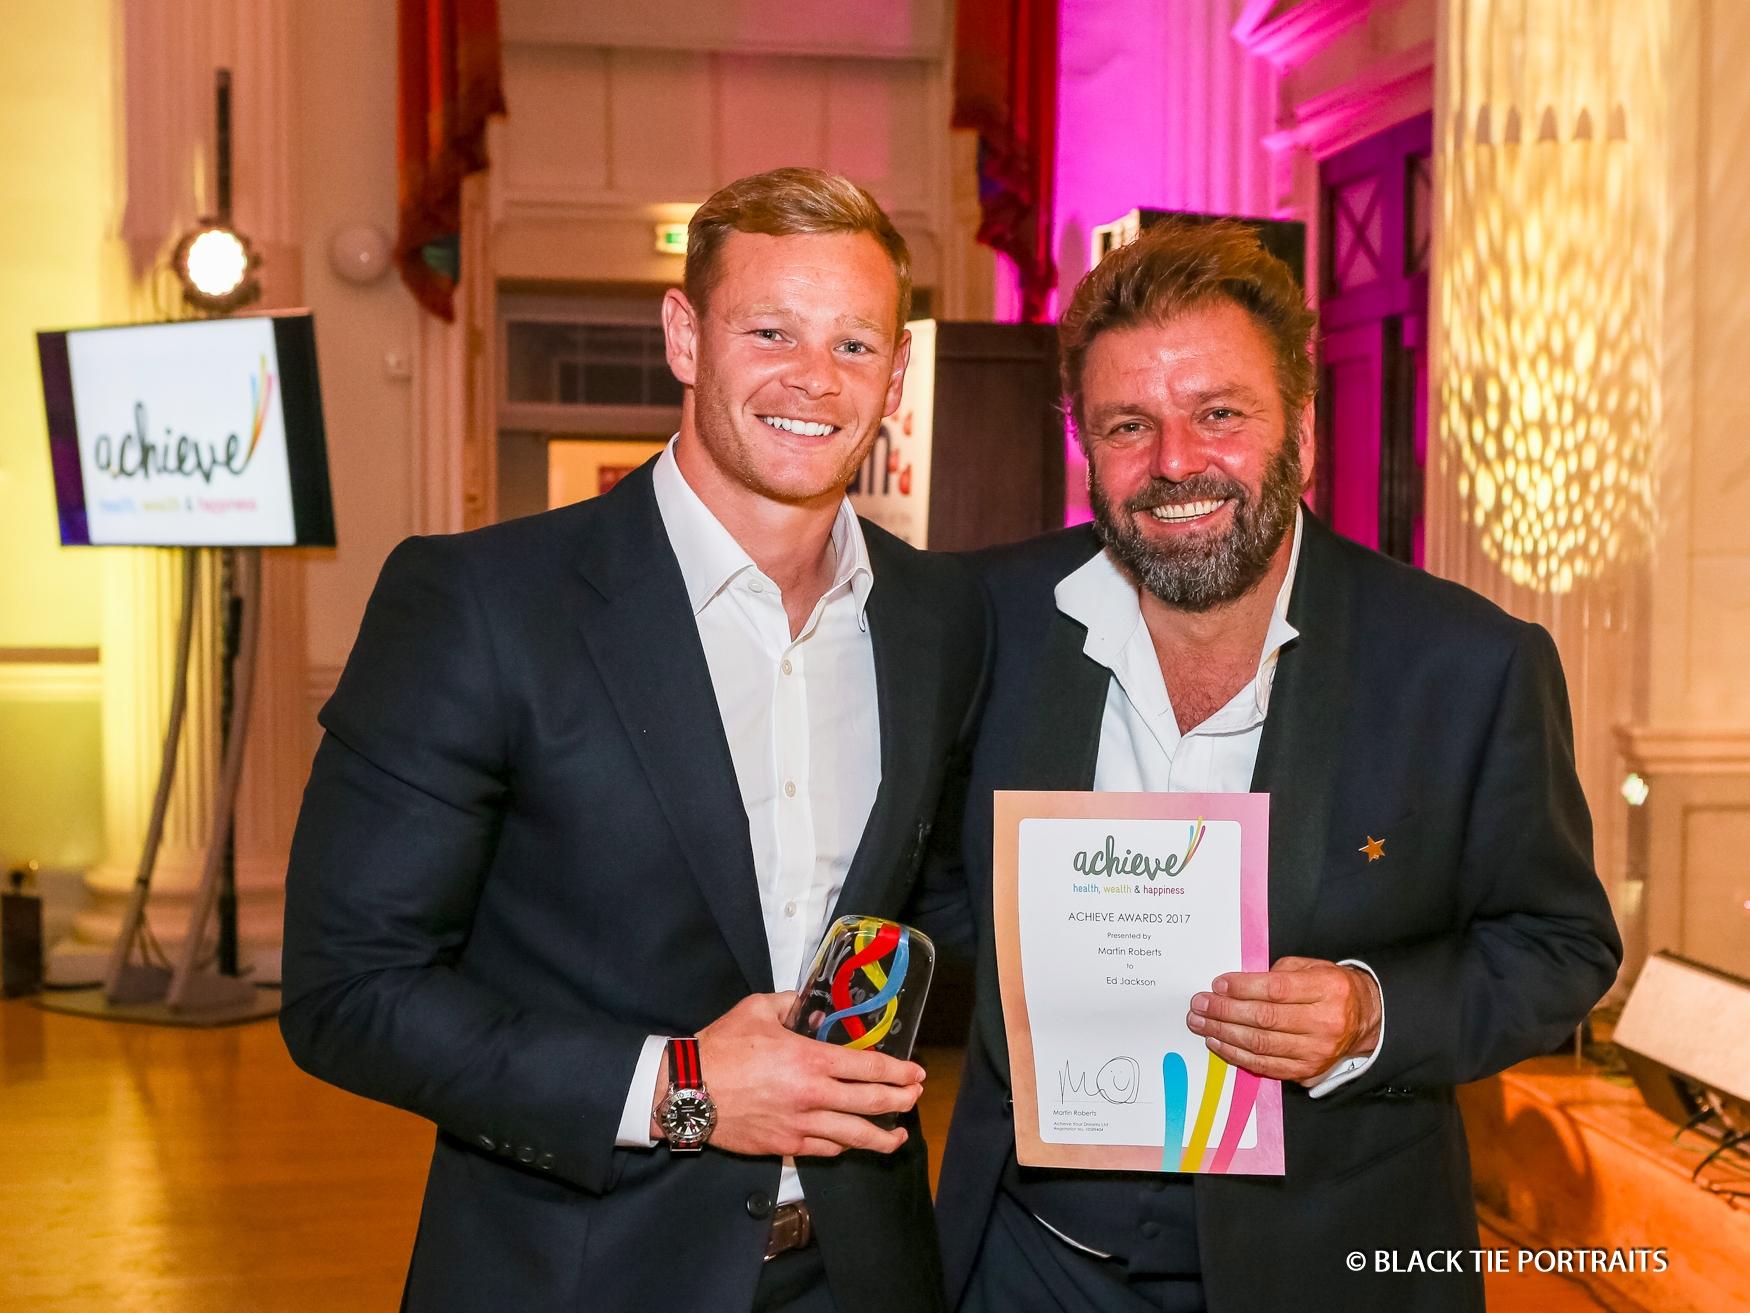 Business Awards Photographer Bath | Black Tie Portraits